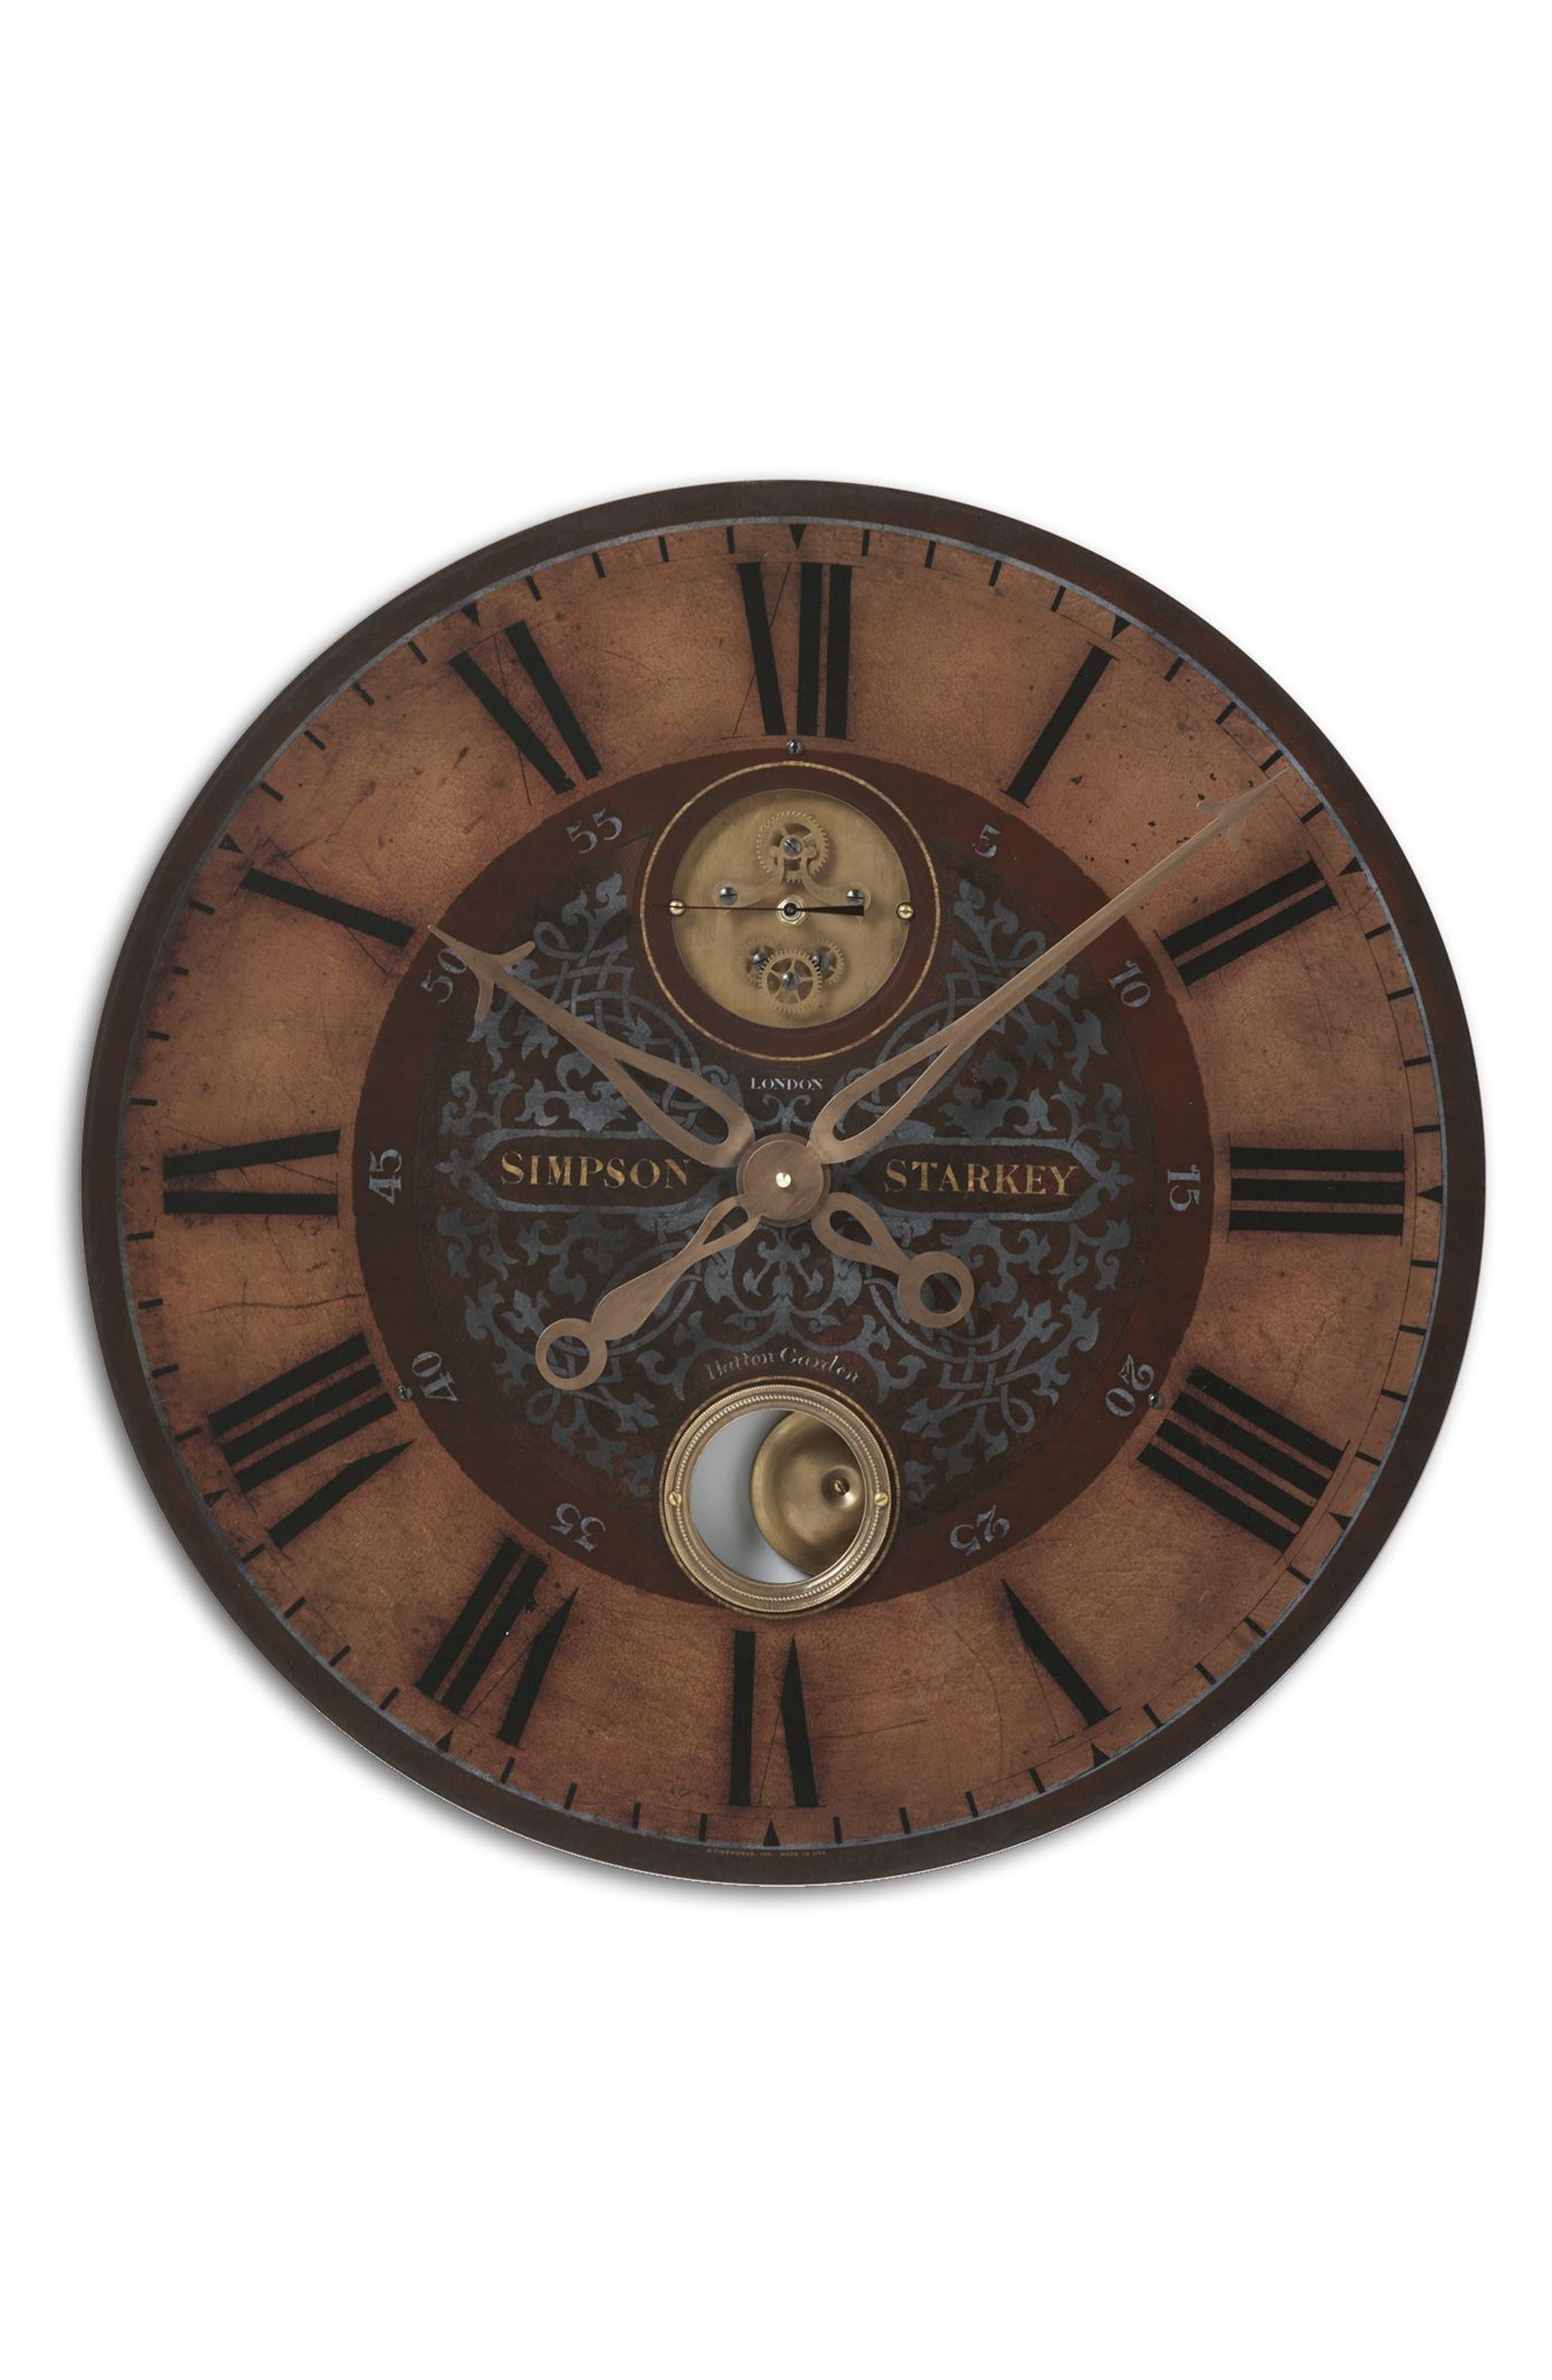 Alternate Image 1 Selected - Uttermost Simpson Starkey Wall Clock